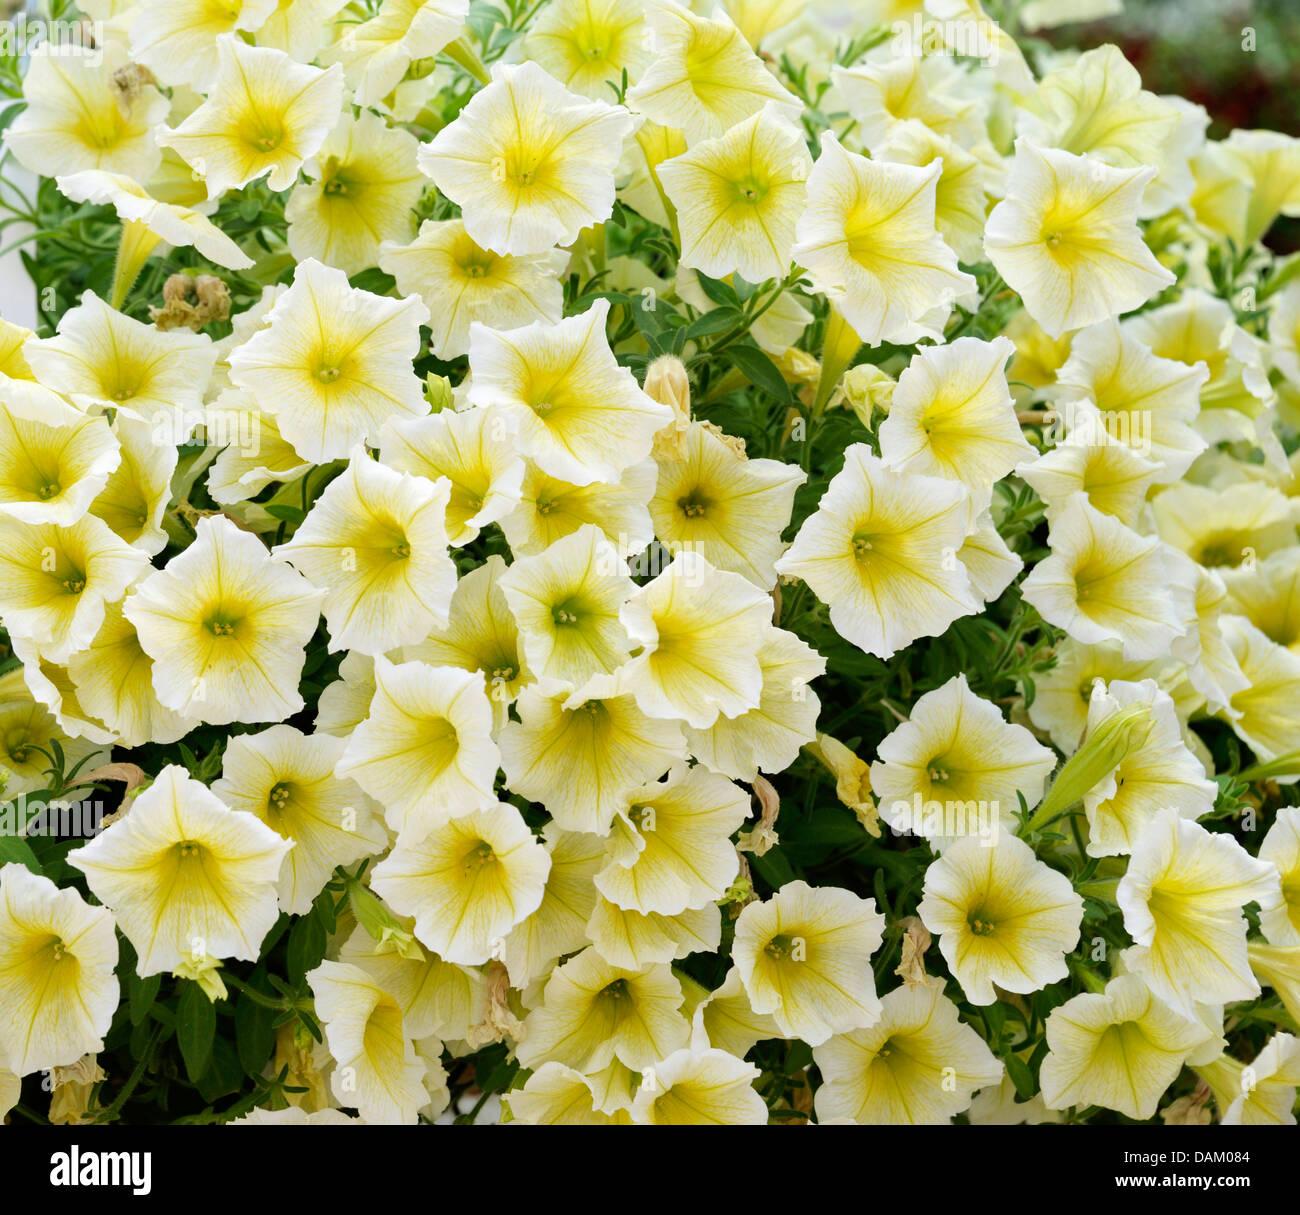 garden petunia (Petunia 'Yellow', Petunia Yellow), Cultivar Yellow, blooming - Stock Image